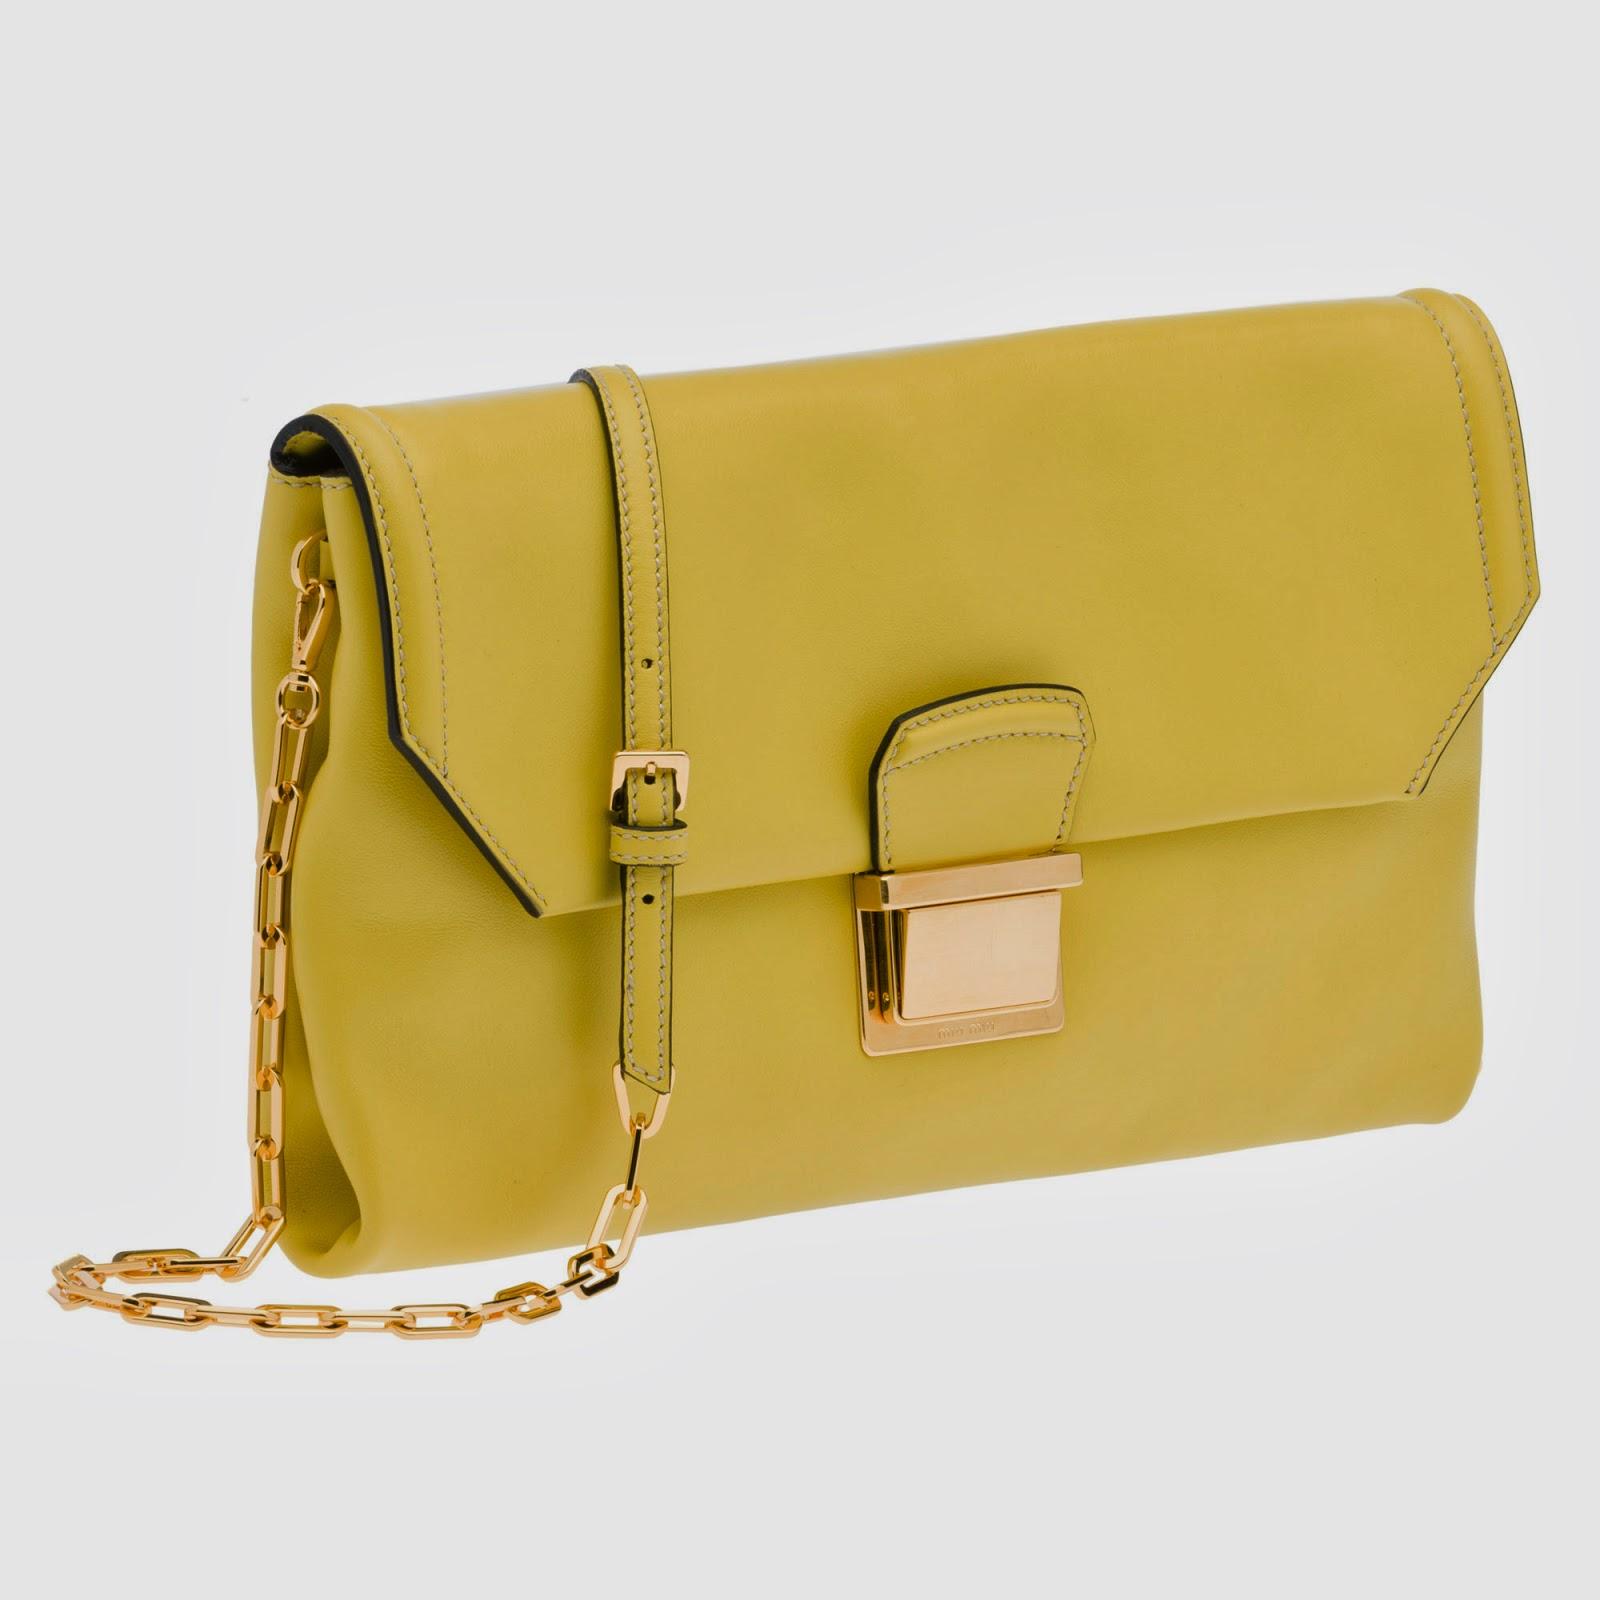 sar%25C4%25B1+omuz+%25C3%25A7antas%25C4%25B1 Miu Miu Herbst Winter 2014 Handtaschen Modelle